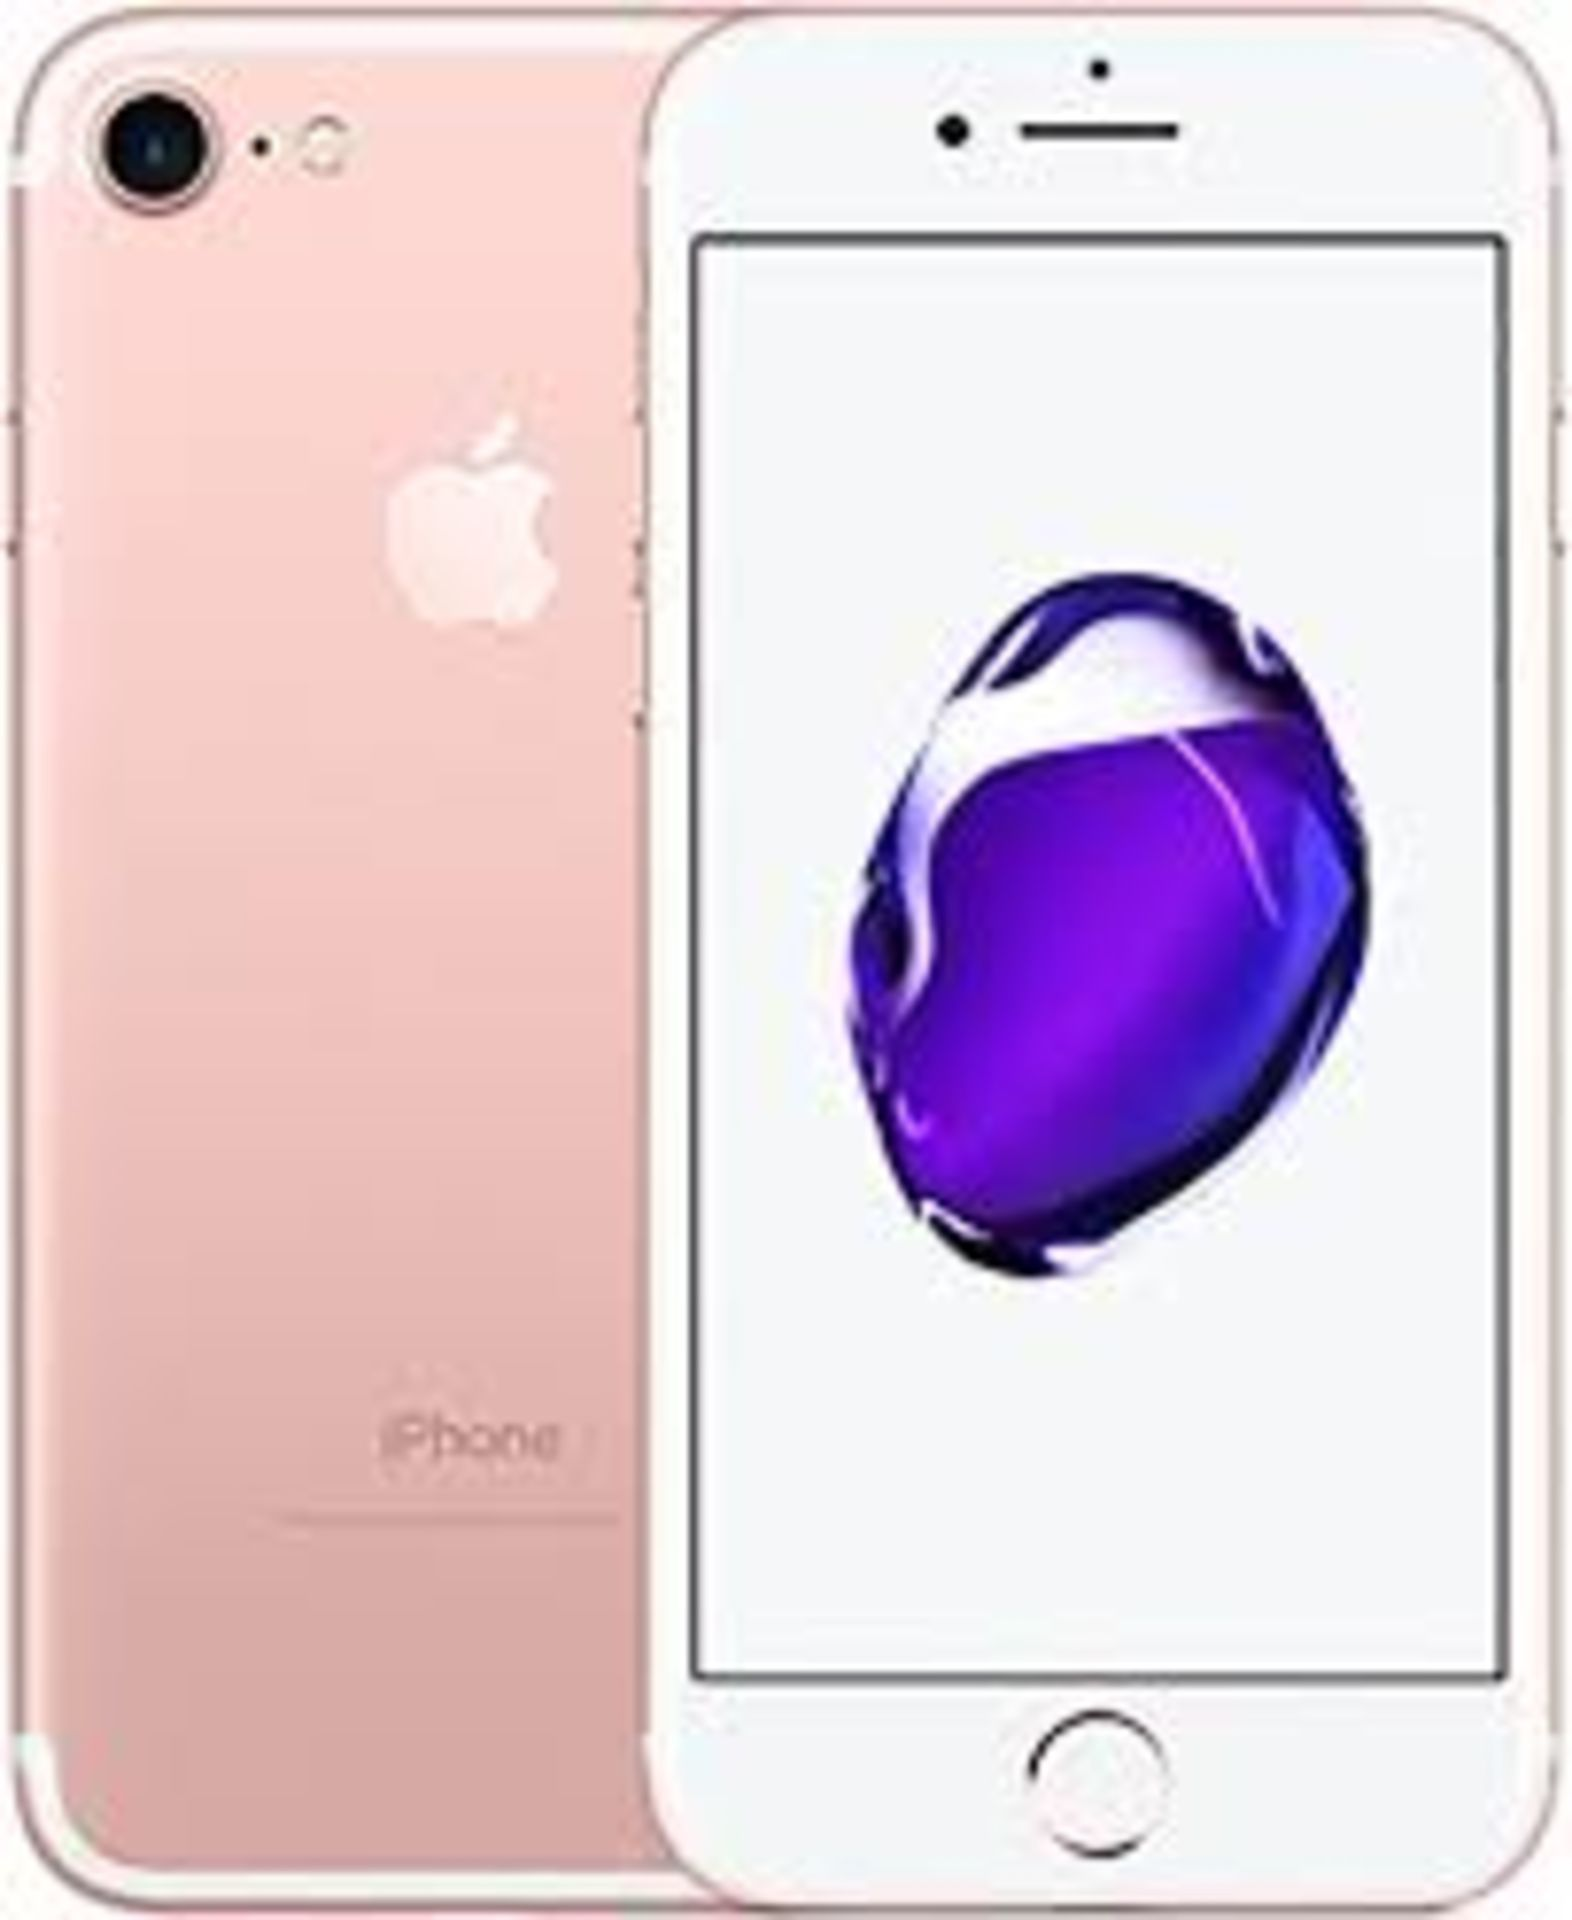 RRP £320 Apple iPhone 7 32GB Rose Gold